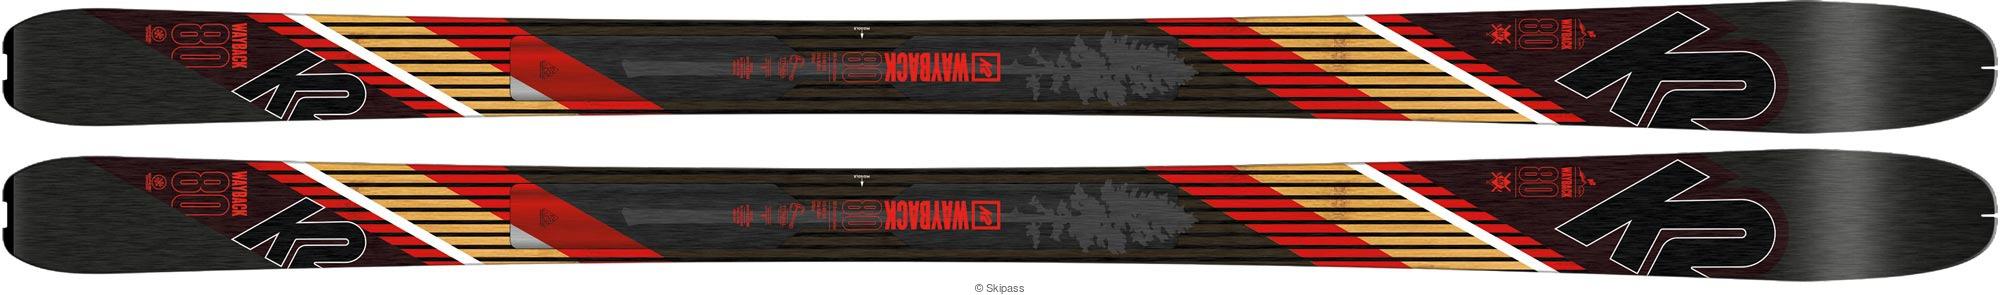 K2 Wayback 80